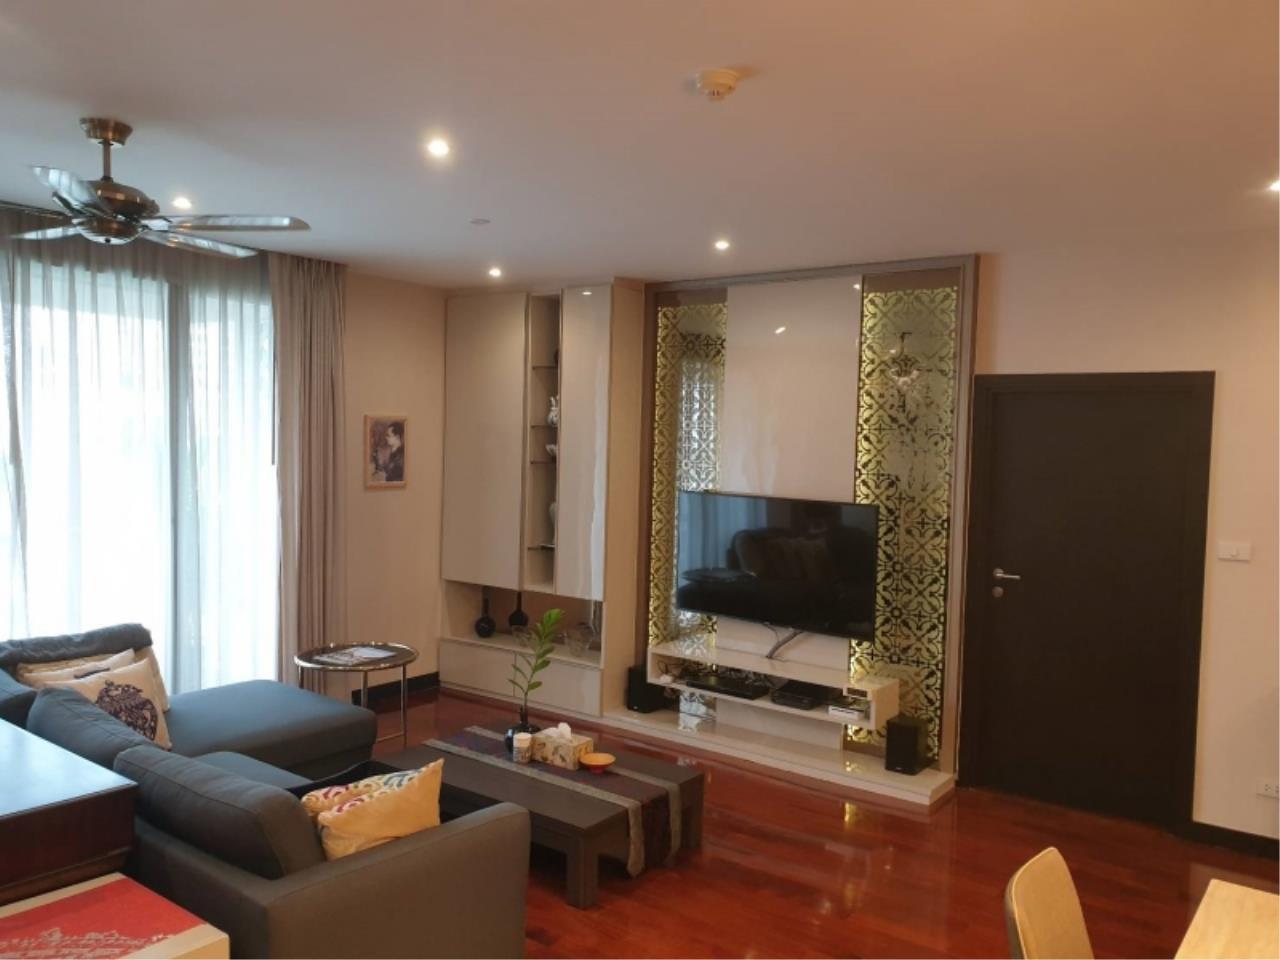 Century21 Skylux Agency's Wilshire / Condo For Sale / 3 Bedroom / 156.27 SQM / BTS Phrom Phong / Bangkok 1